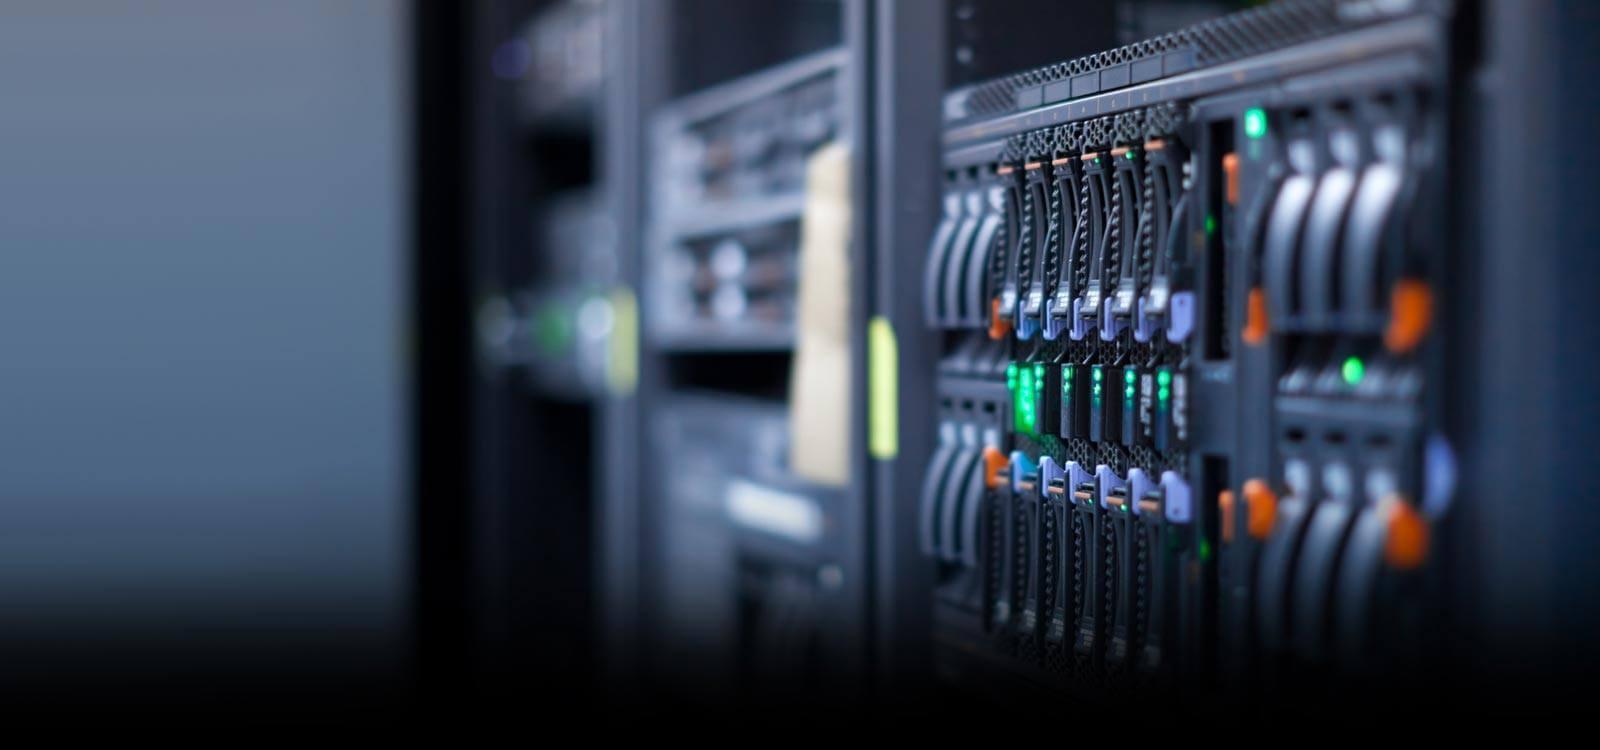 shirazweb web hosting service server shiraz bg